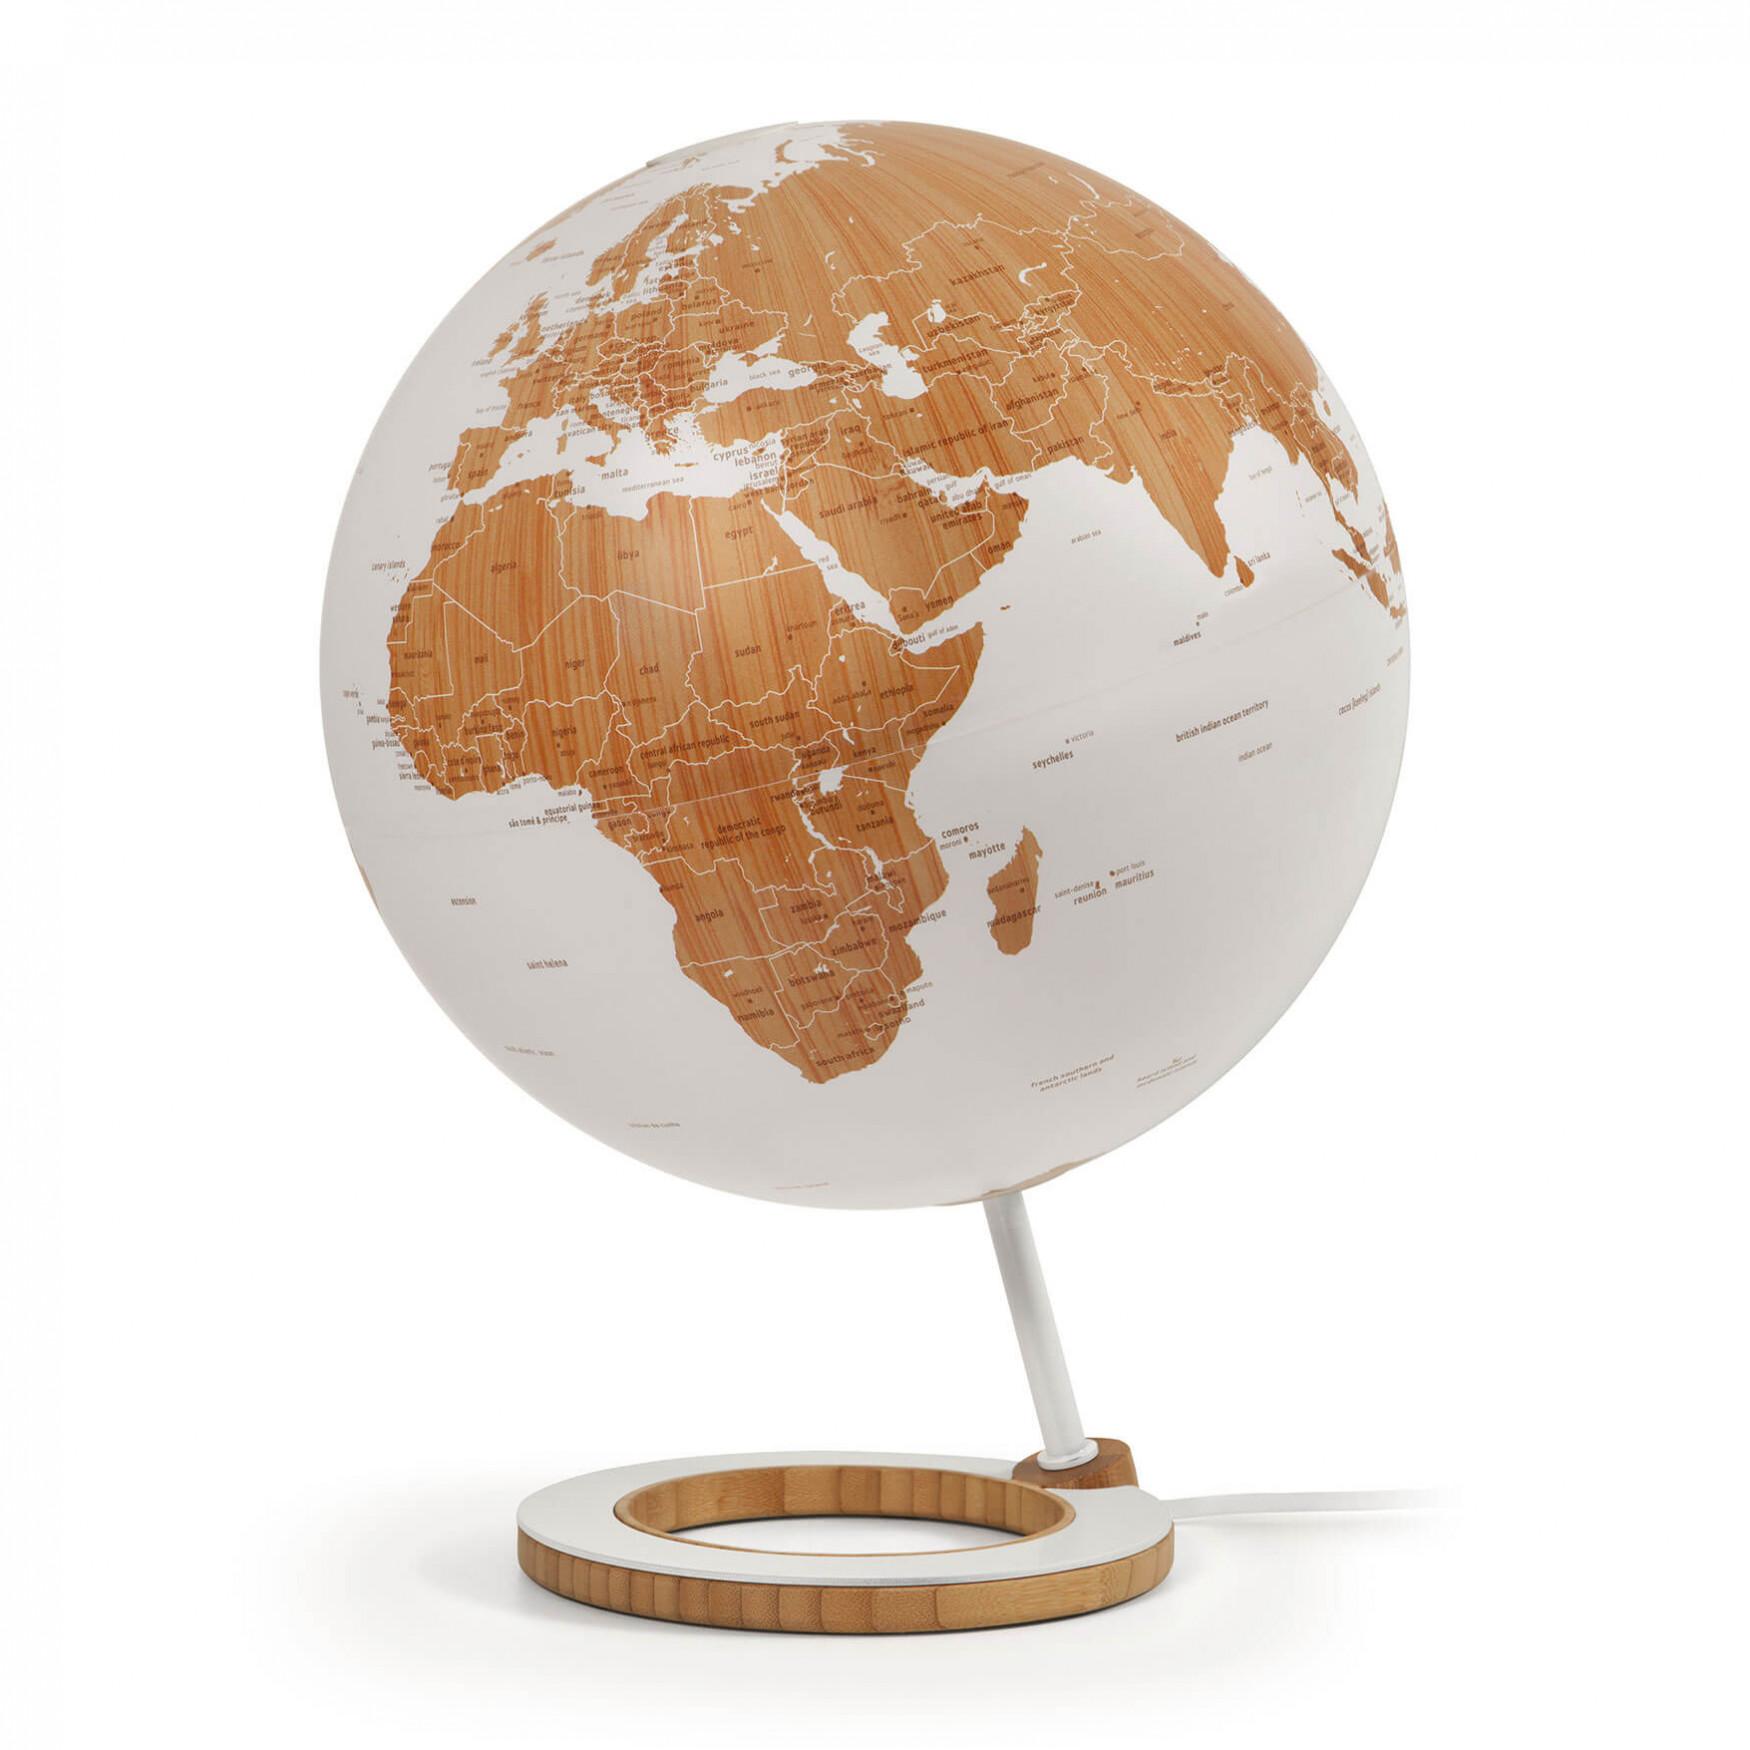 Bamboo Illuminated Globe